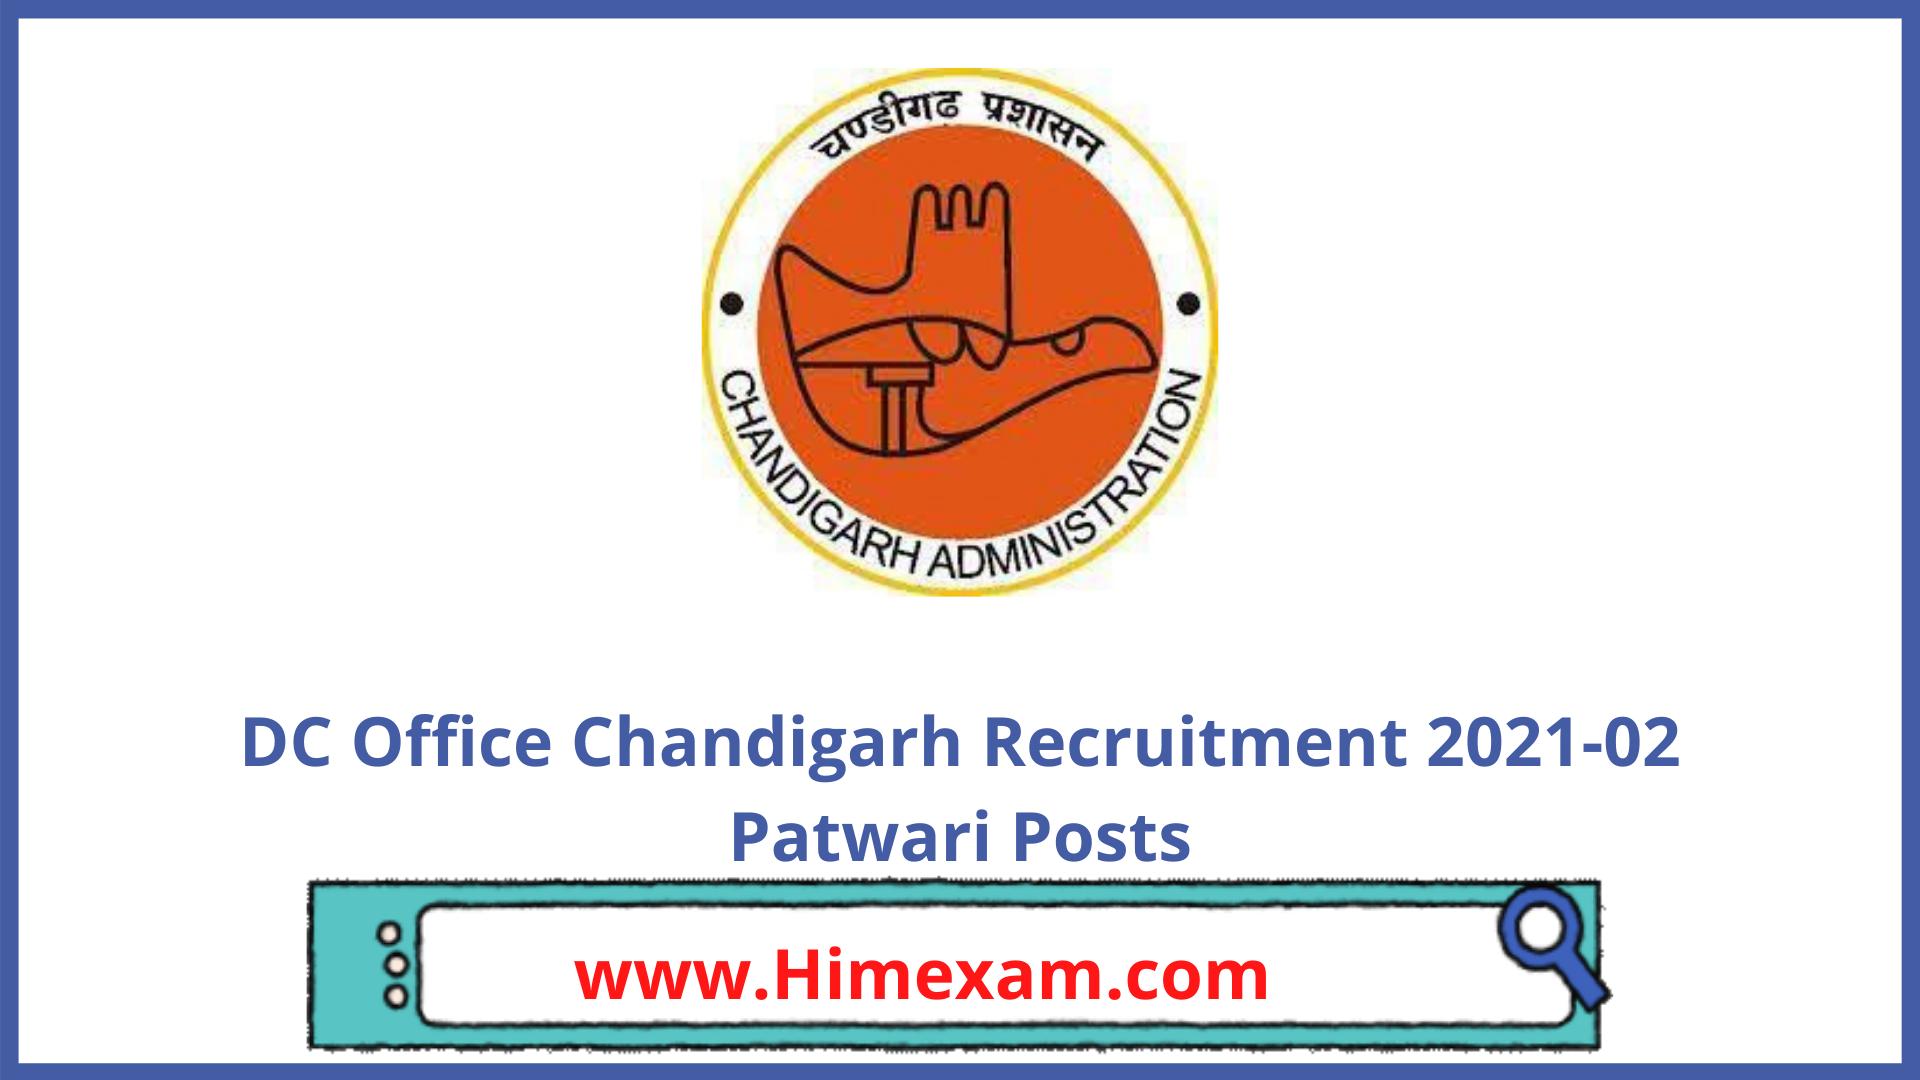 DC Office Chandigarh Recruitment 2021-02 Patwari Posts